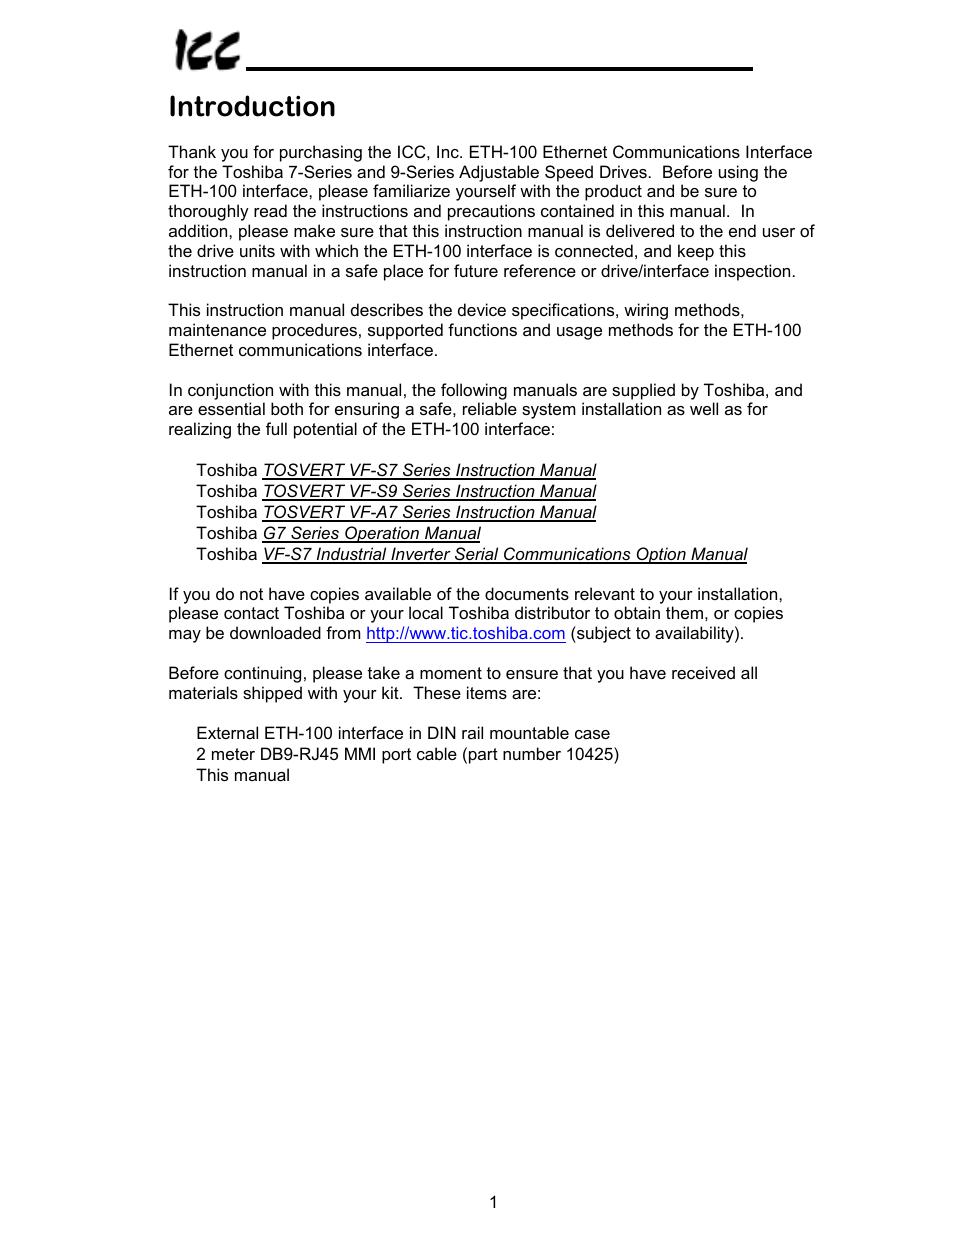 Toshiba Vf S7 Manual Alternator Wiring Diagram Array Introduction A7 User Page 2 50 Rh Manualsdir